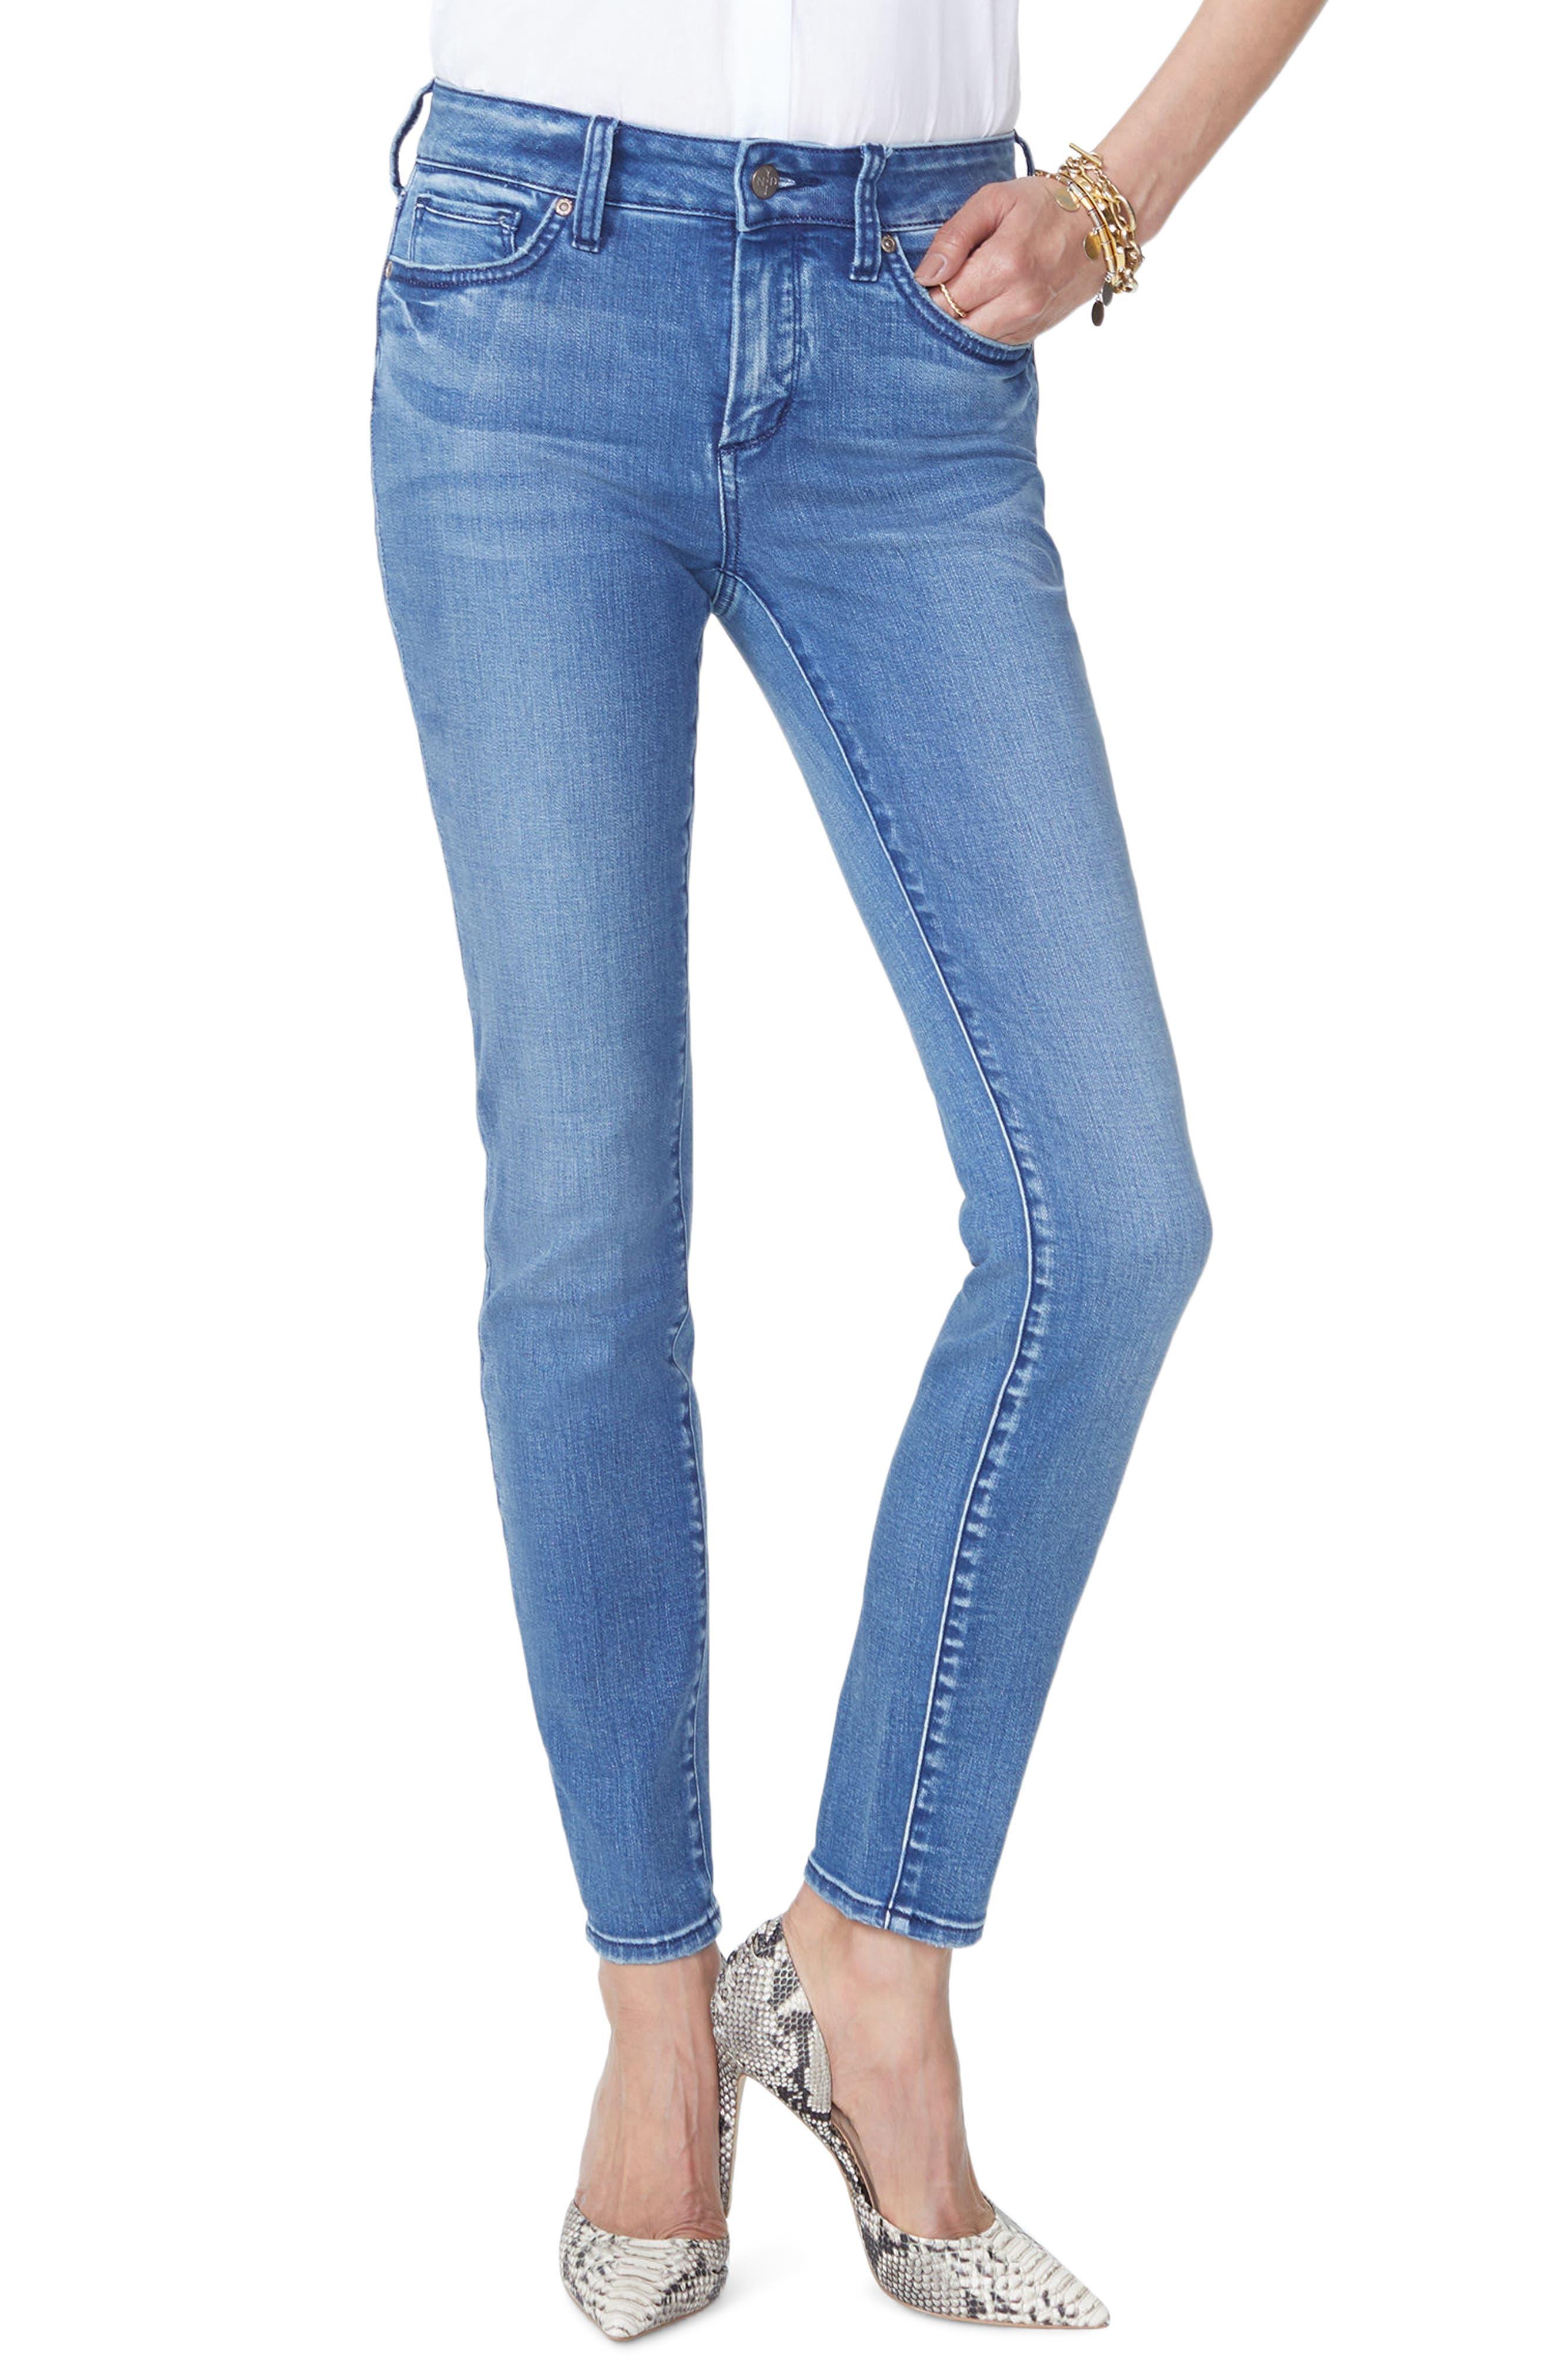 Ami High Waist Stretch Skinny Jeans,                             Main thumbnail 1, color,                             WISHFUL